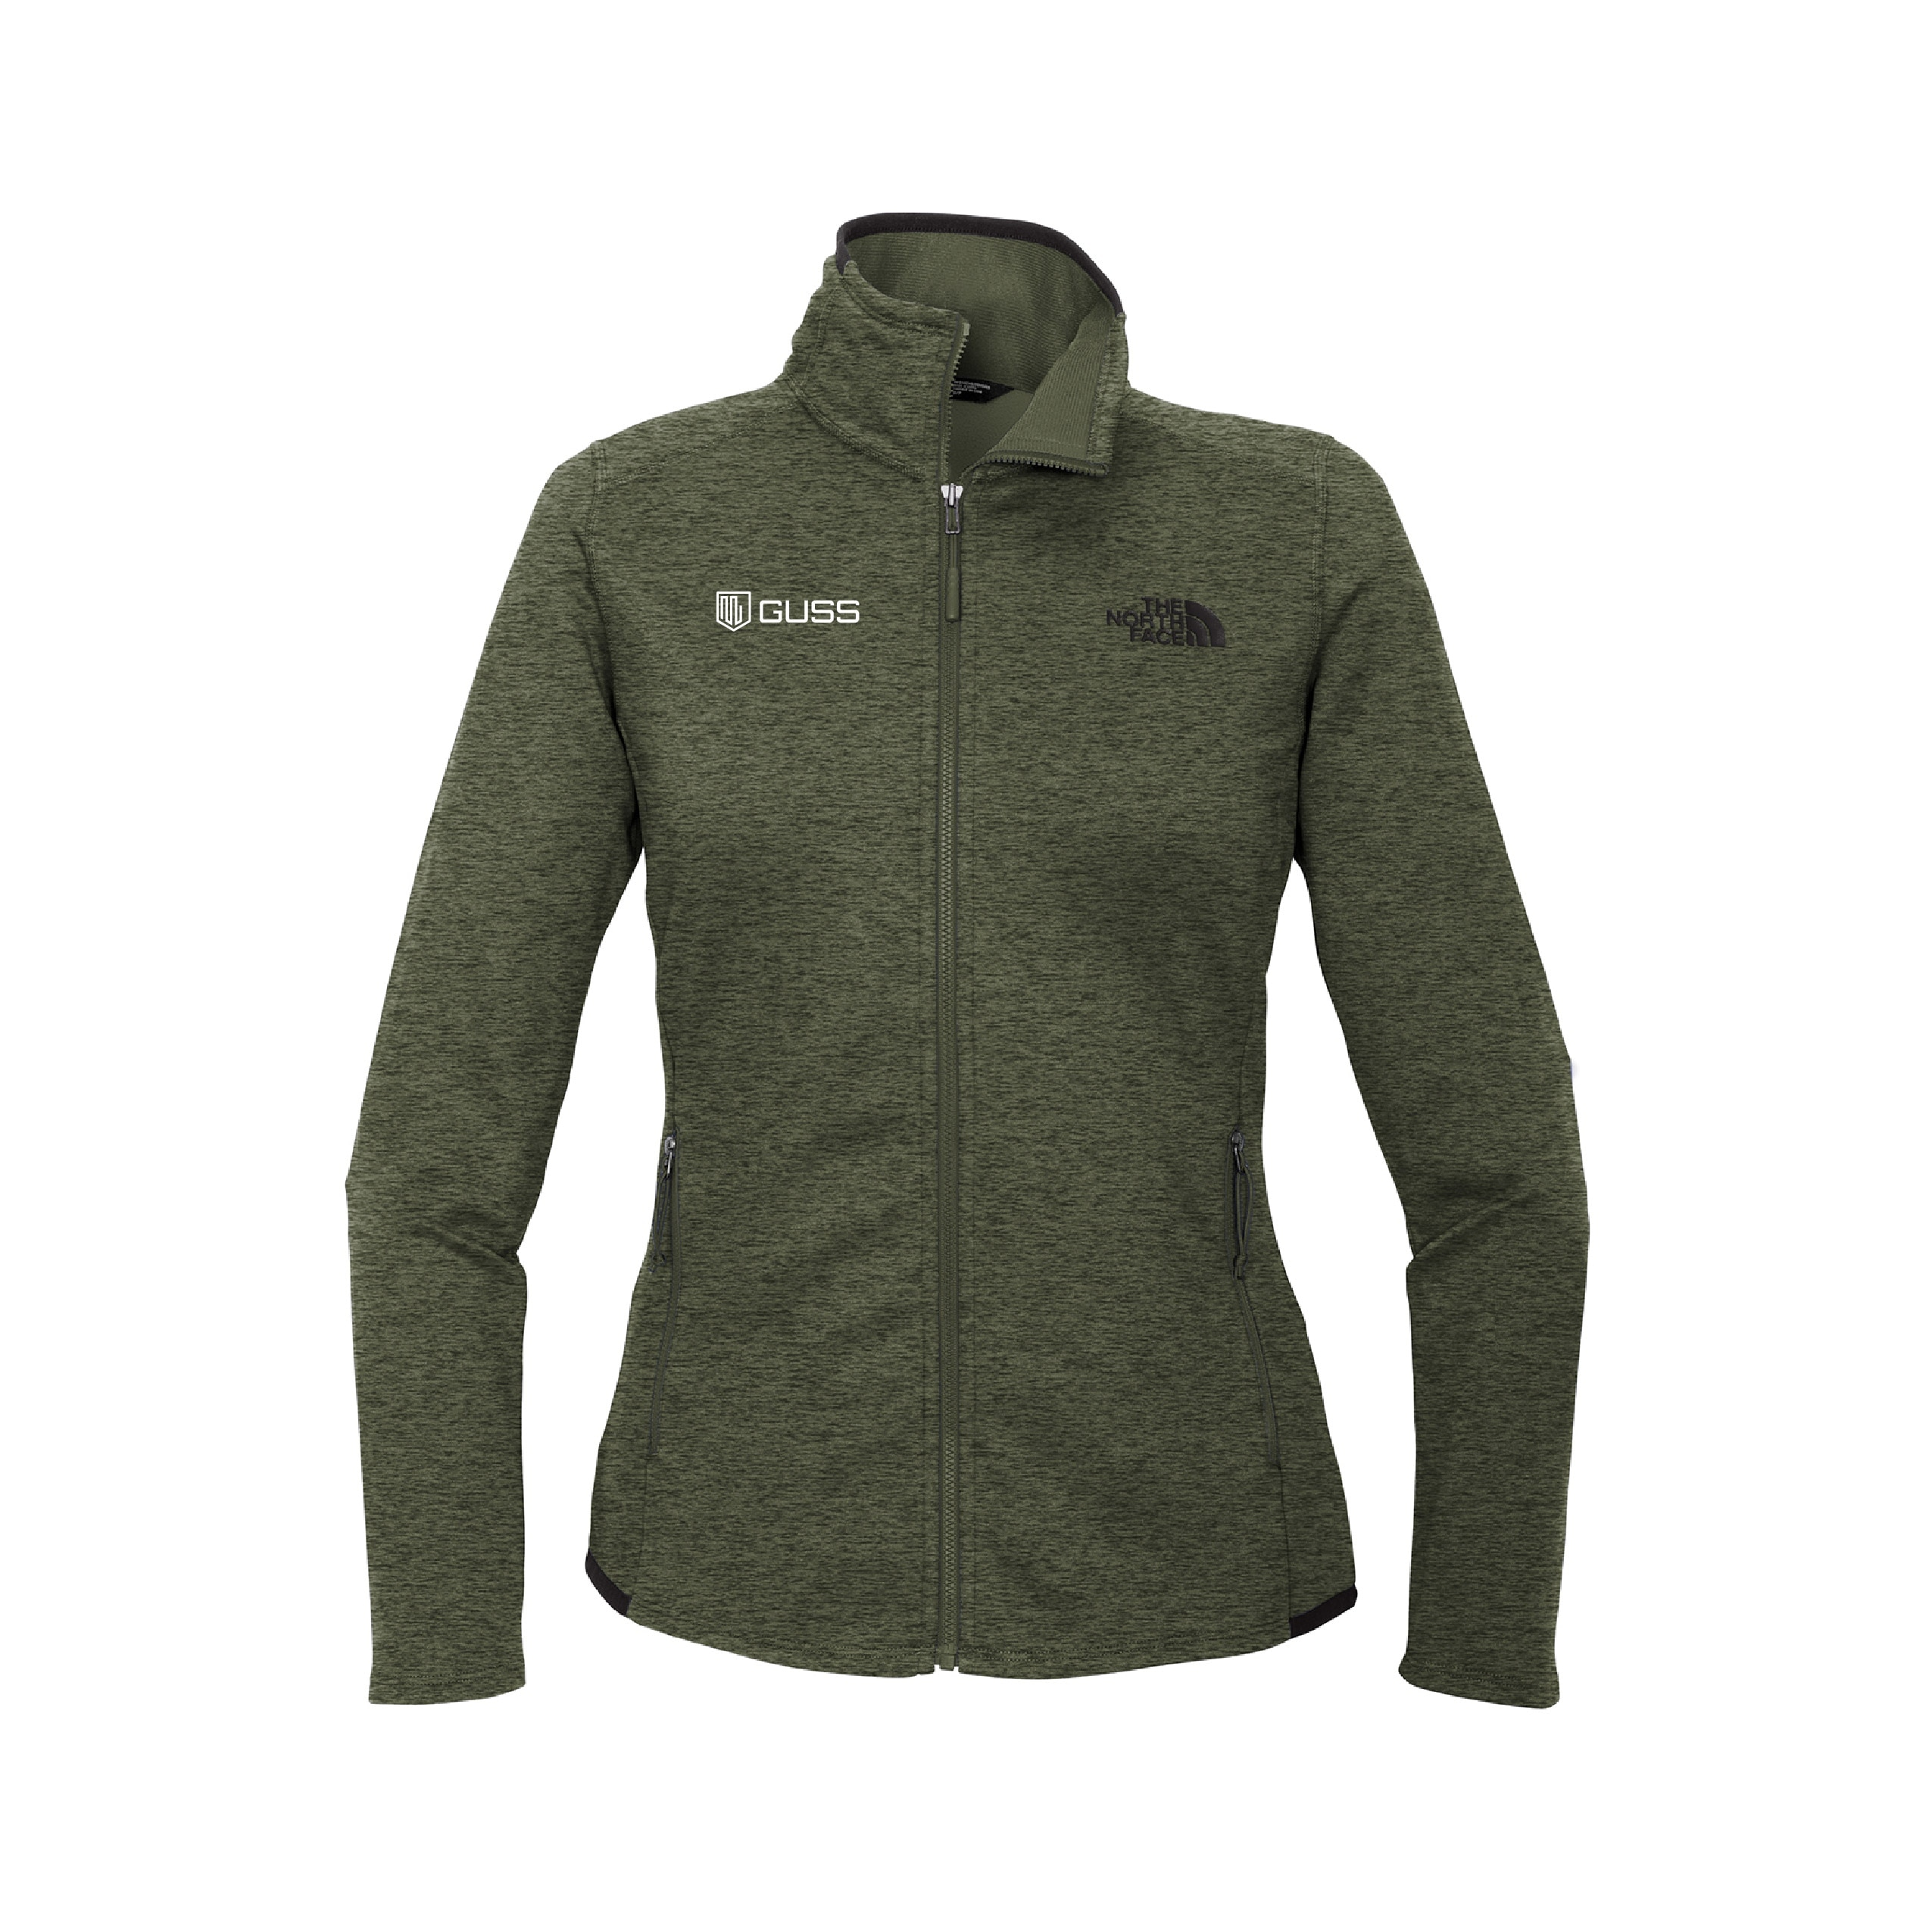 Women's - North Face Skyline Fleece Jacket